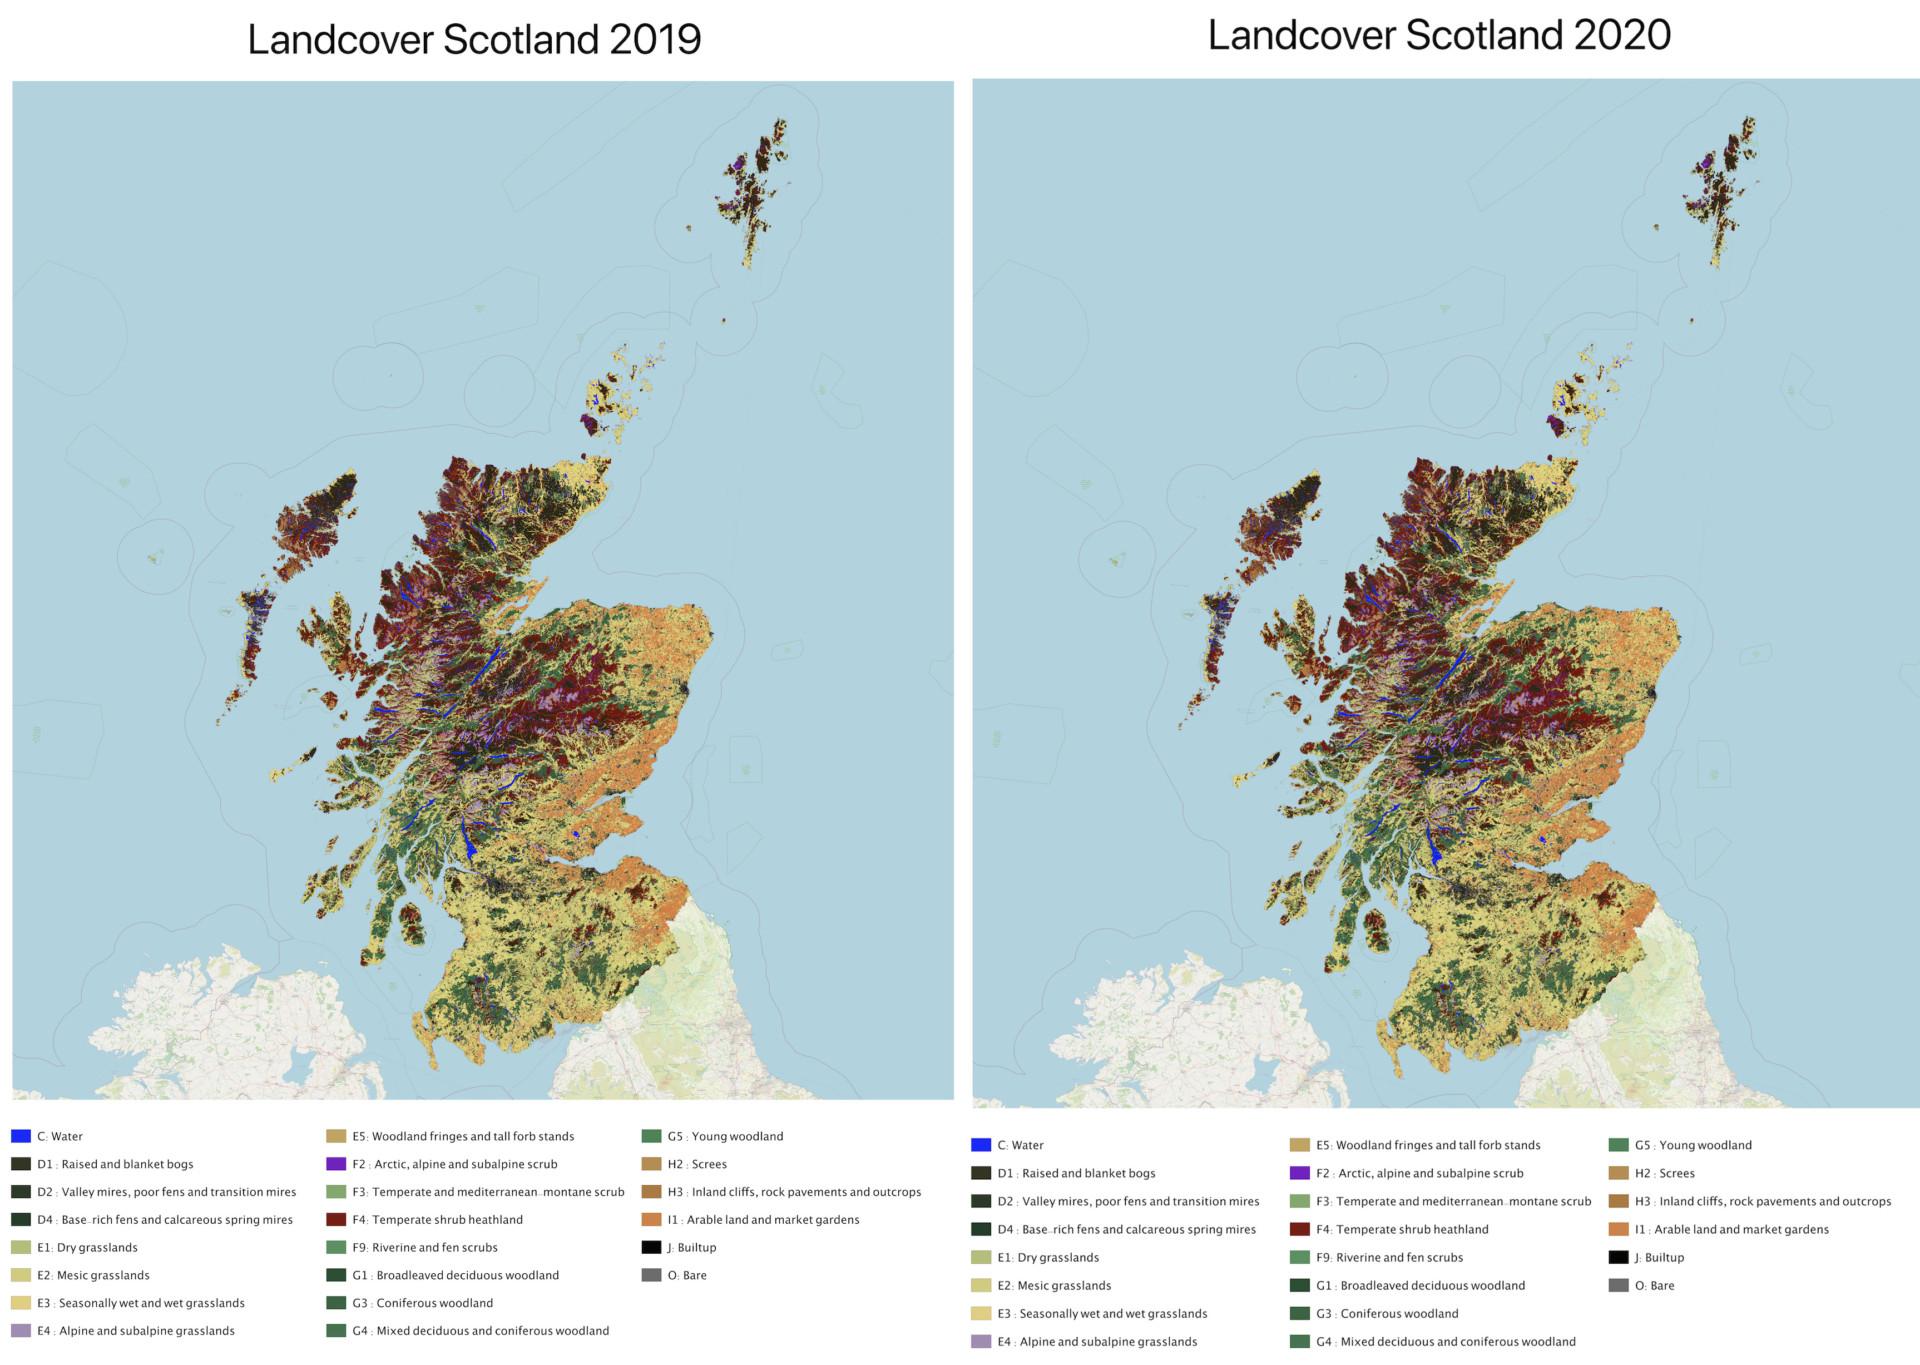 Scottish Landcover Maps 2019 & 2020